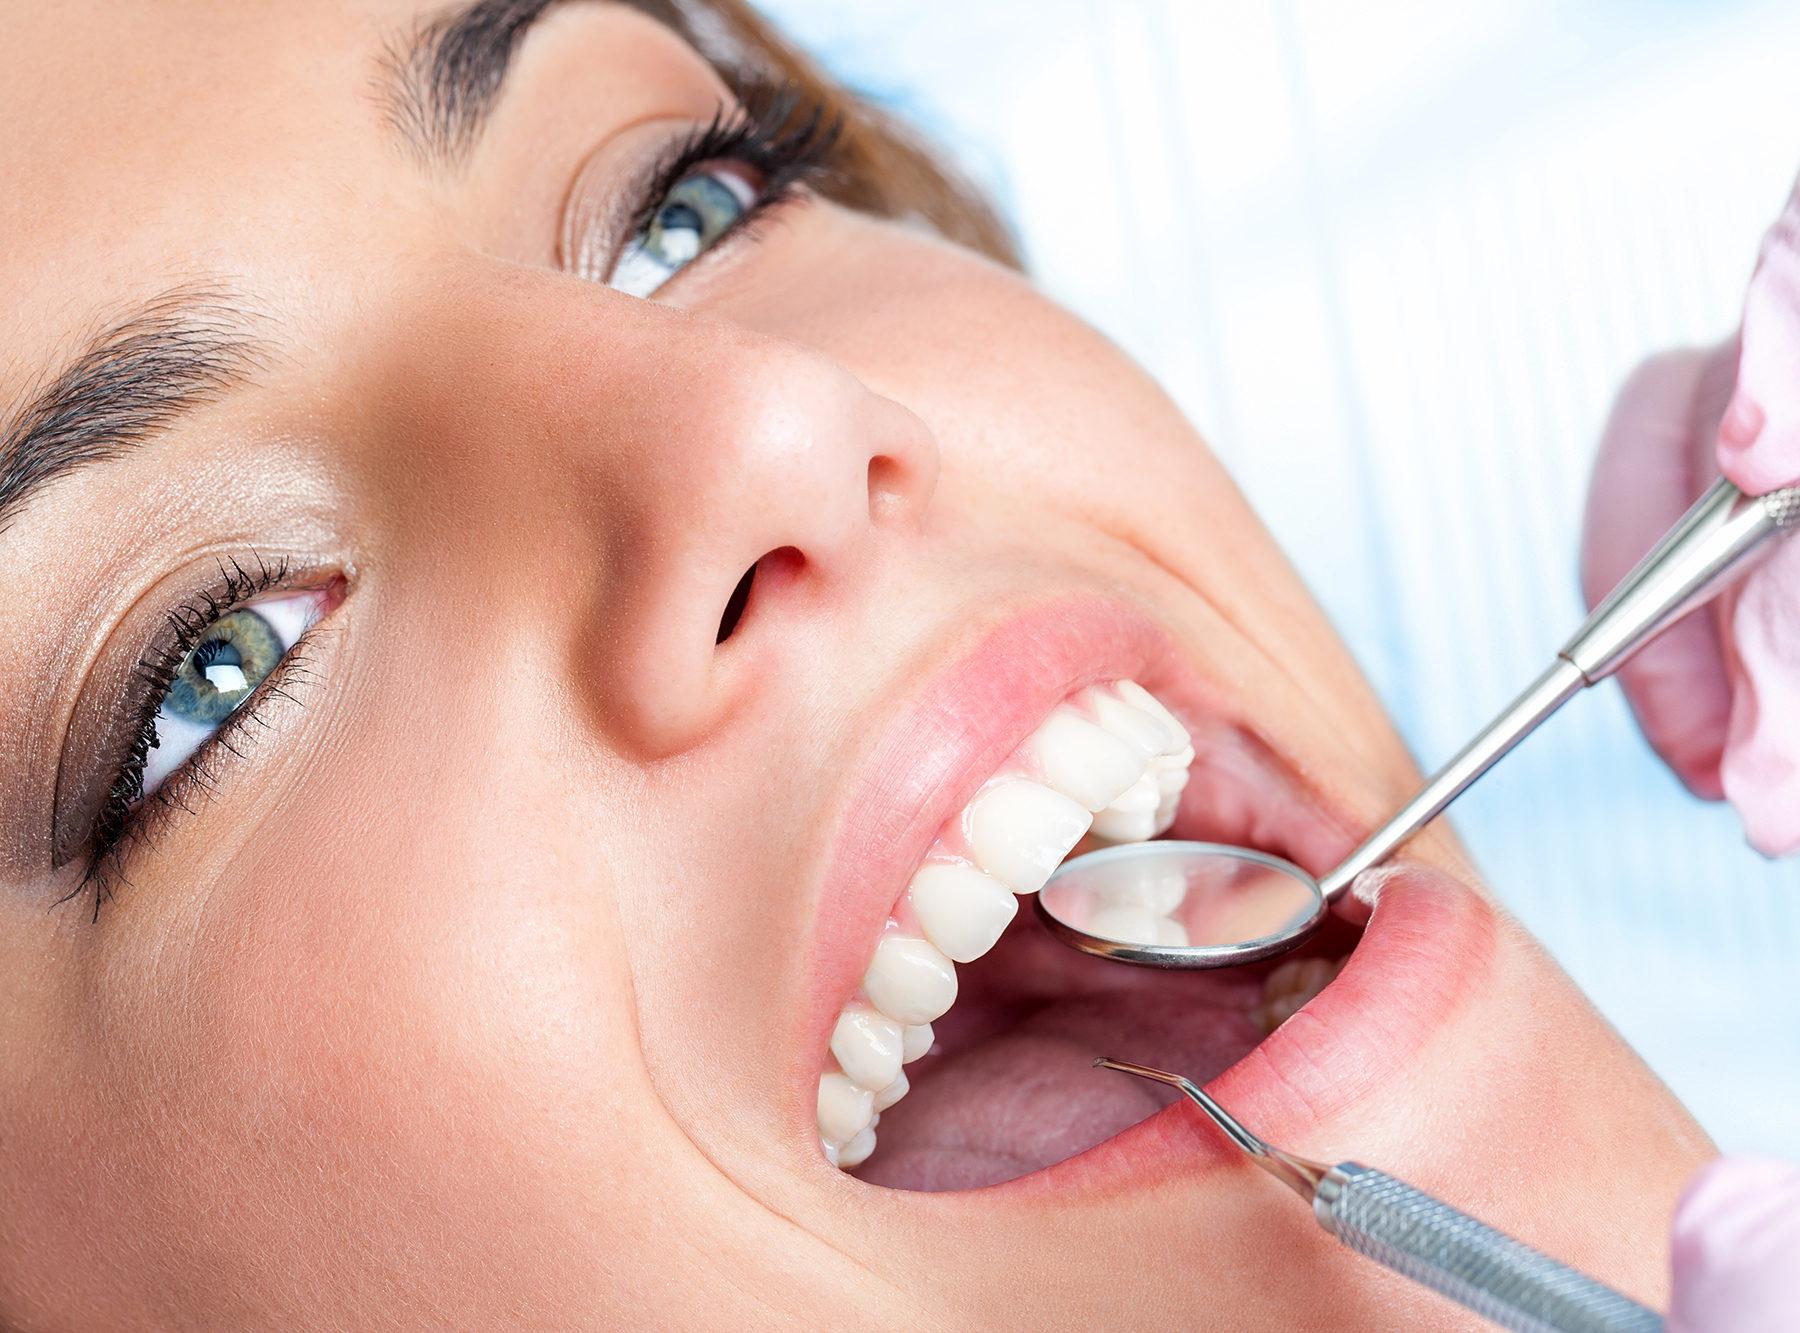 Lakewood Ranch Dental Services - General Dentistry